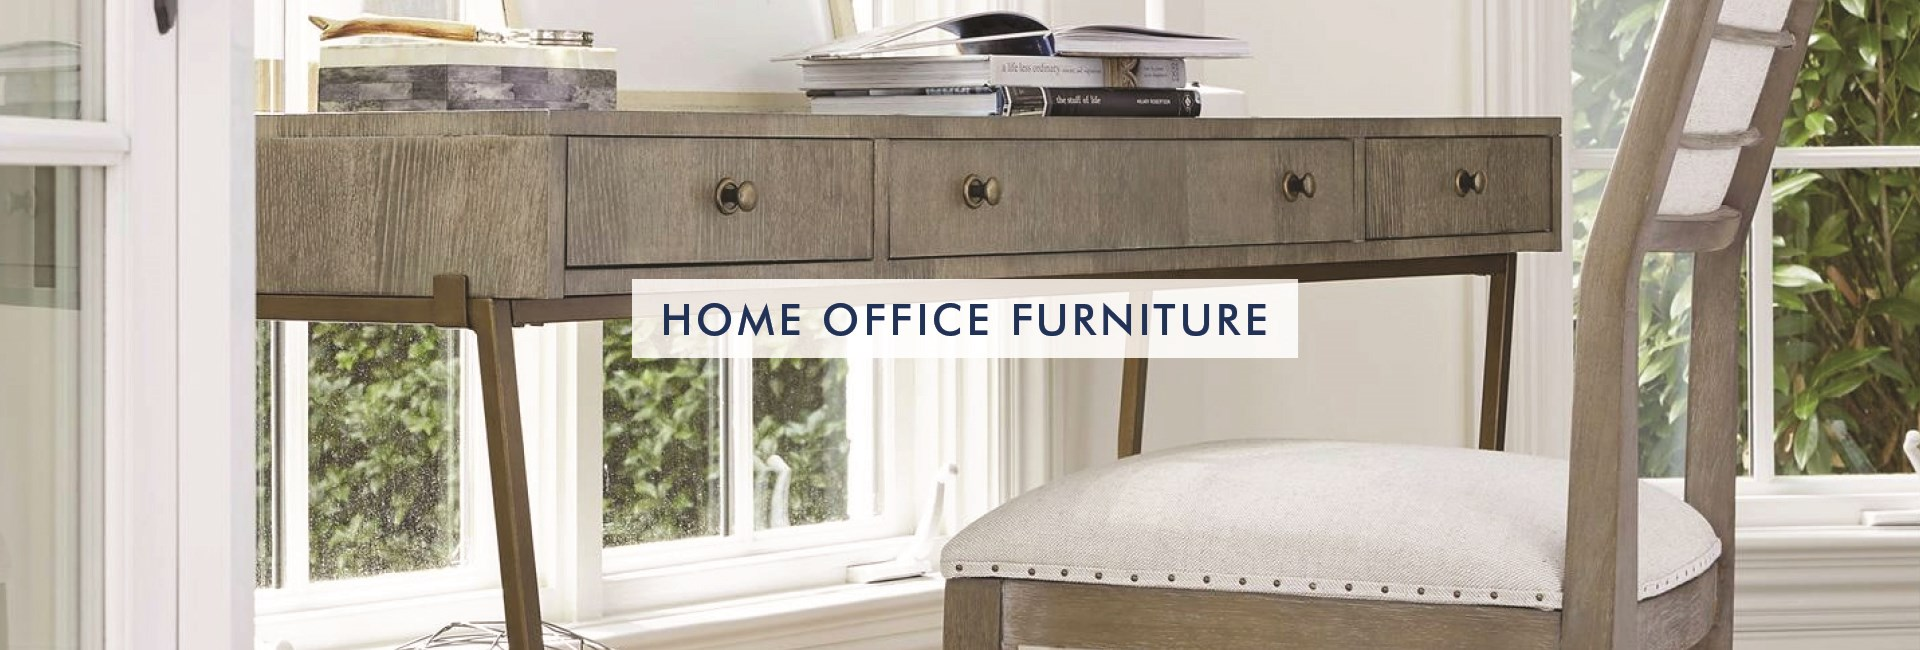 Shop Home Office Furniture Beaumont Port Arthur Lake